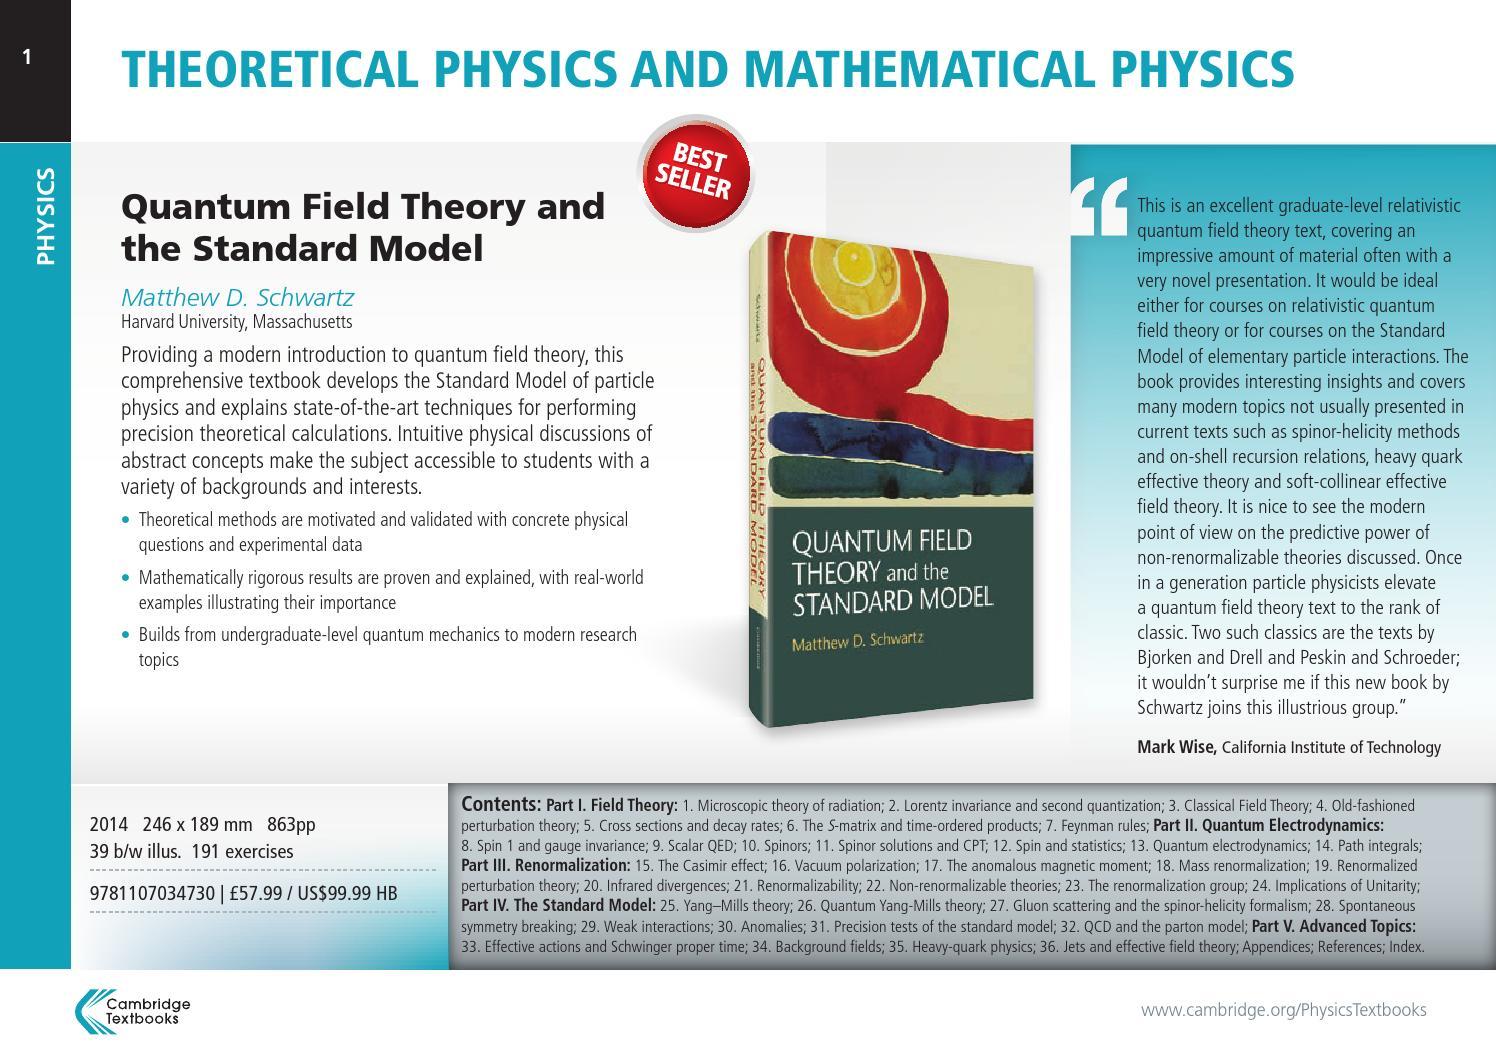 Physics Textbooks from Cambridge by Cambridge University Press - issuu